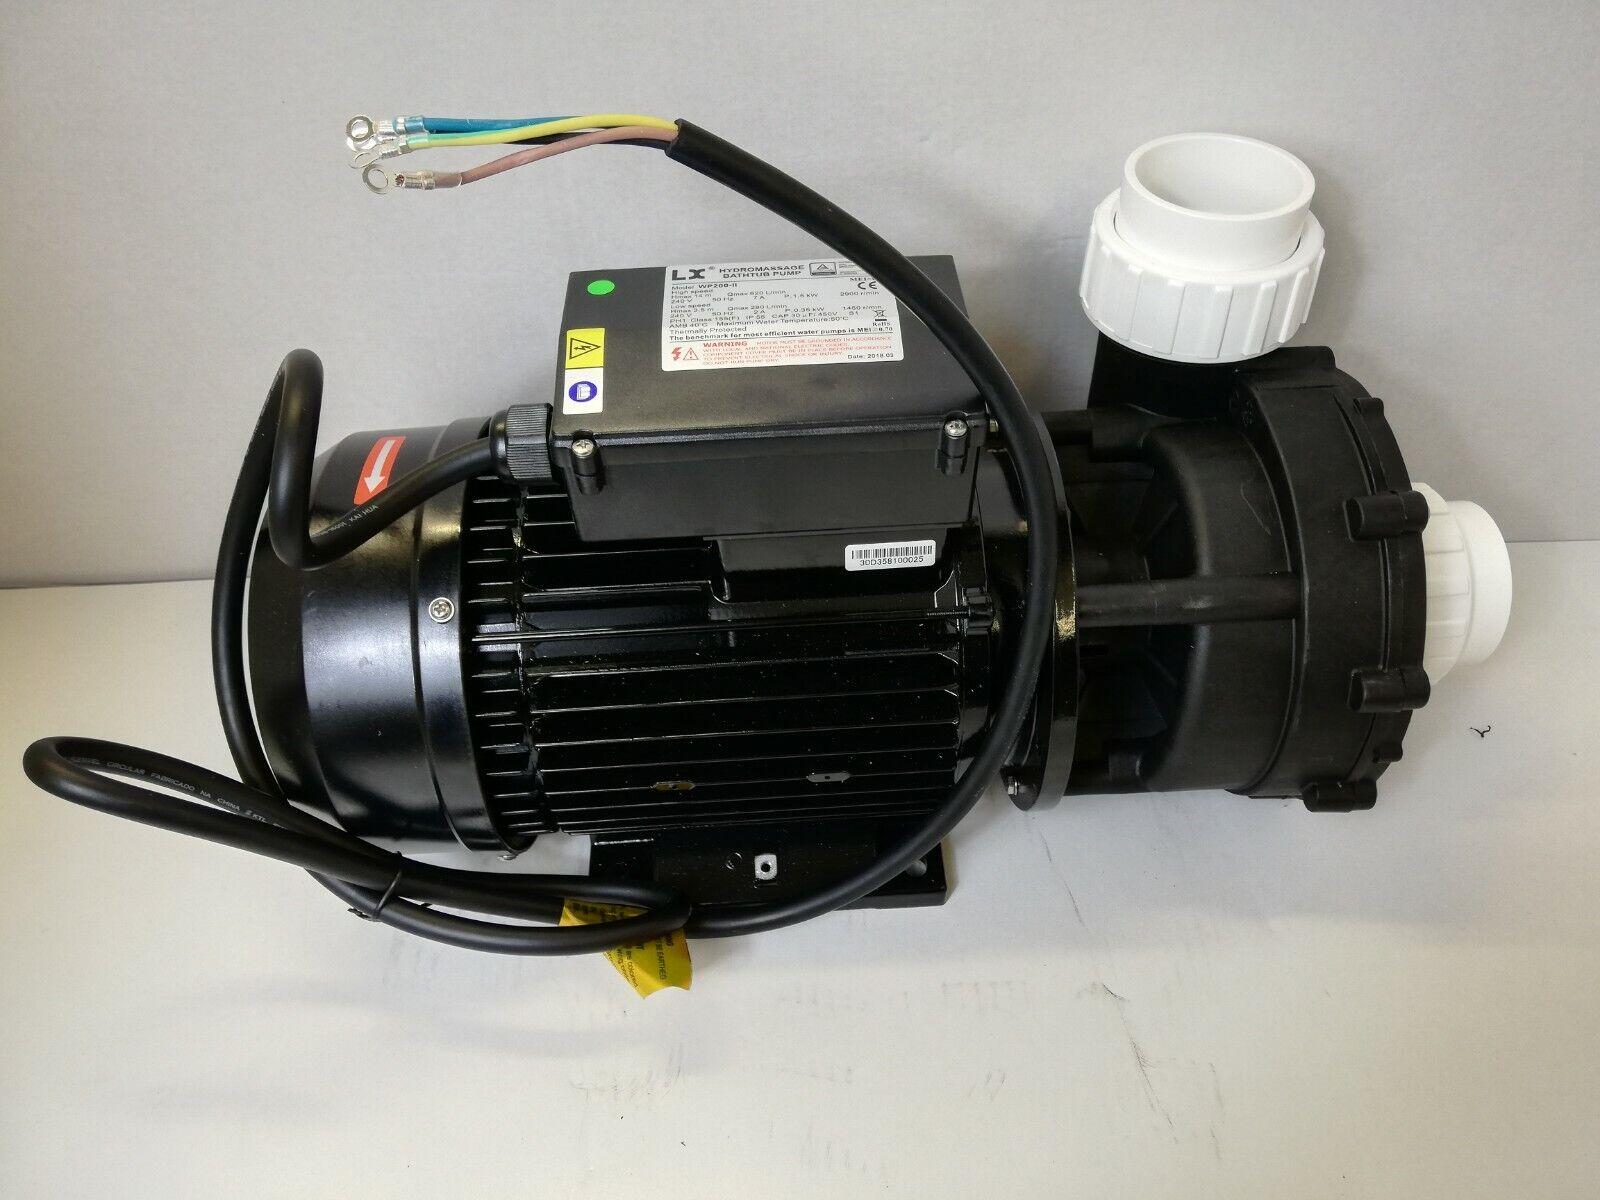 Wp200-ii LX Bomba de Hidromasaje Masaje Whirlpool 2200   450w, Dos Niveles